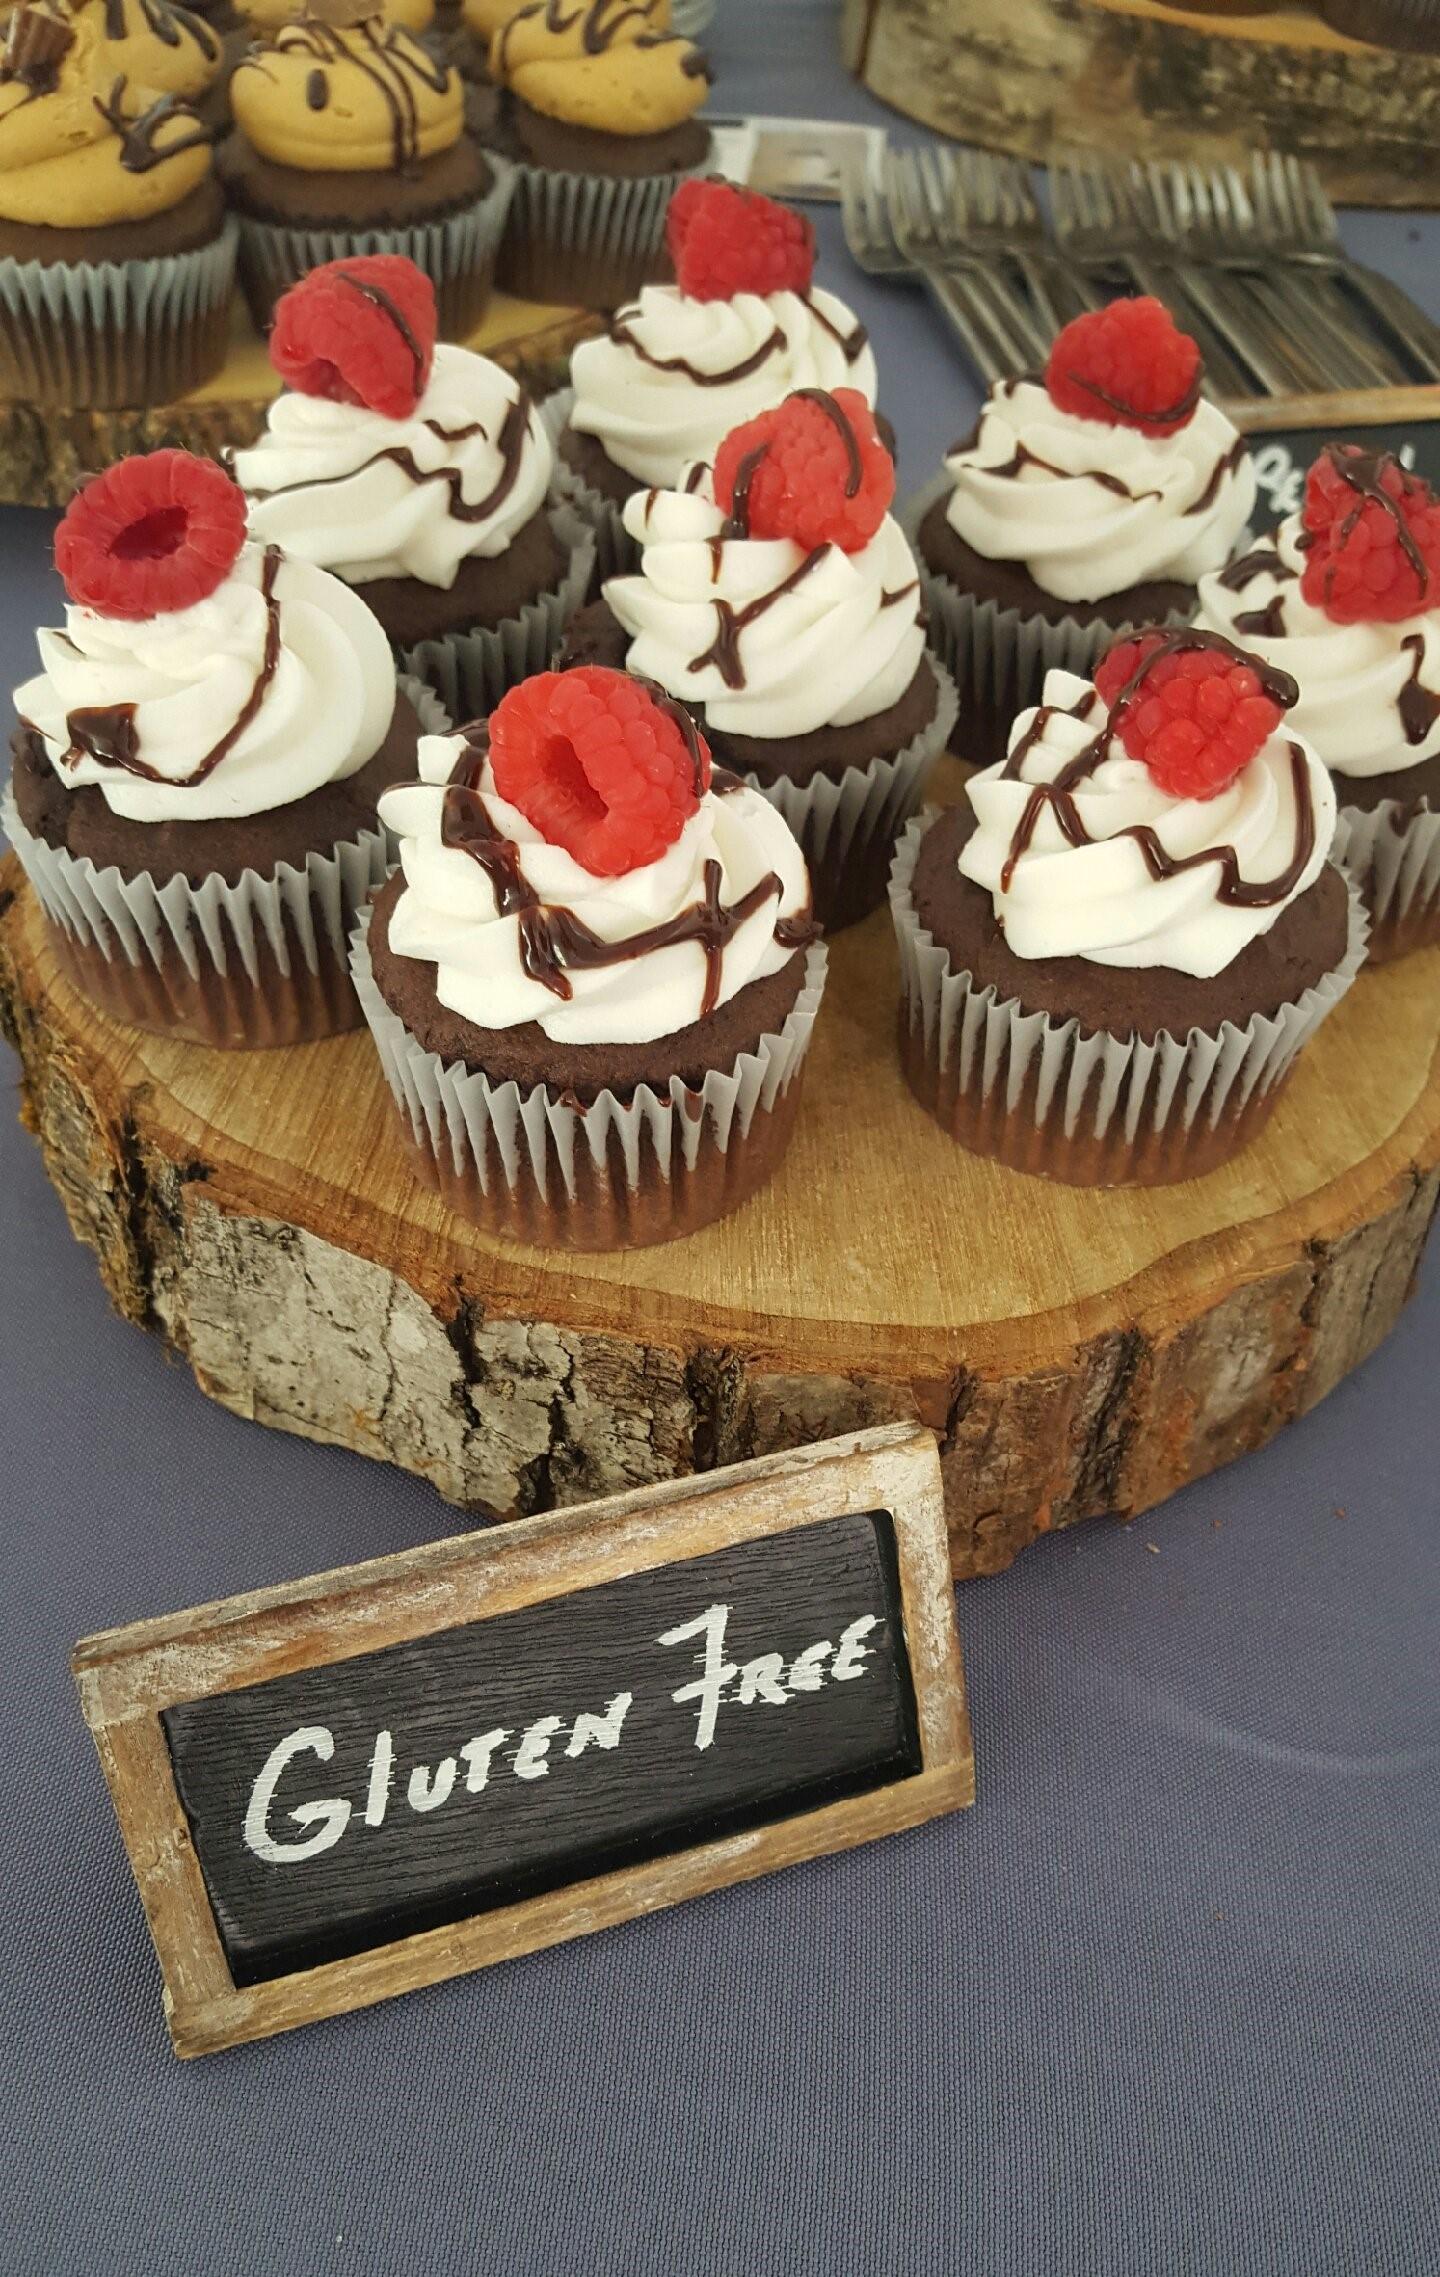 cupcakes-glutenfree.jpeg